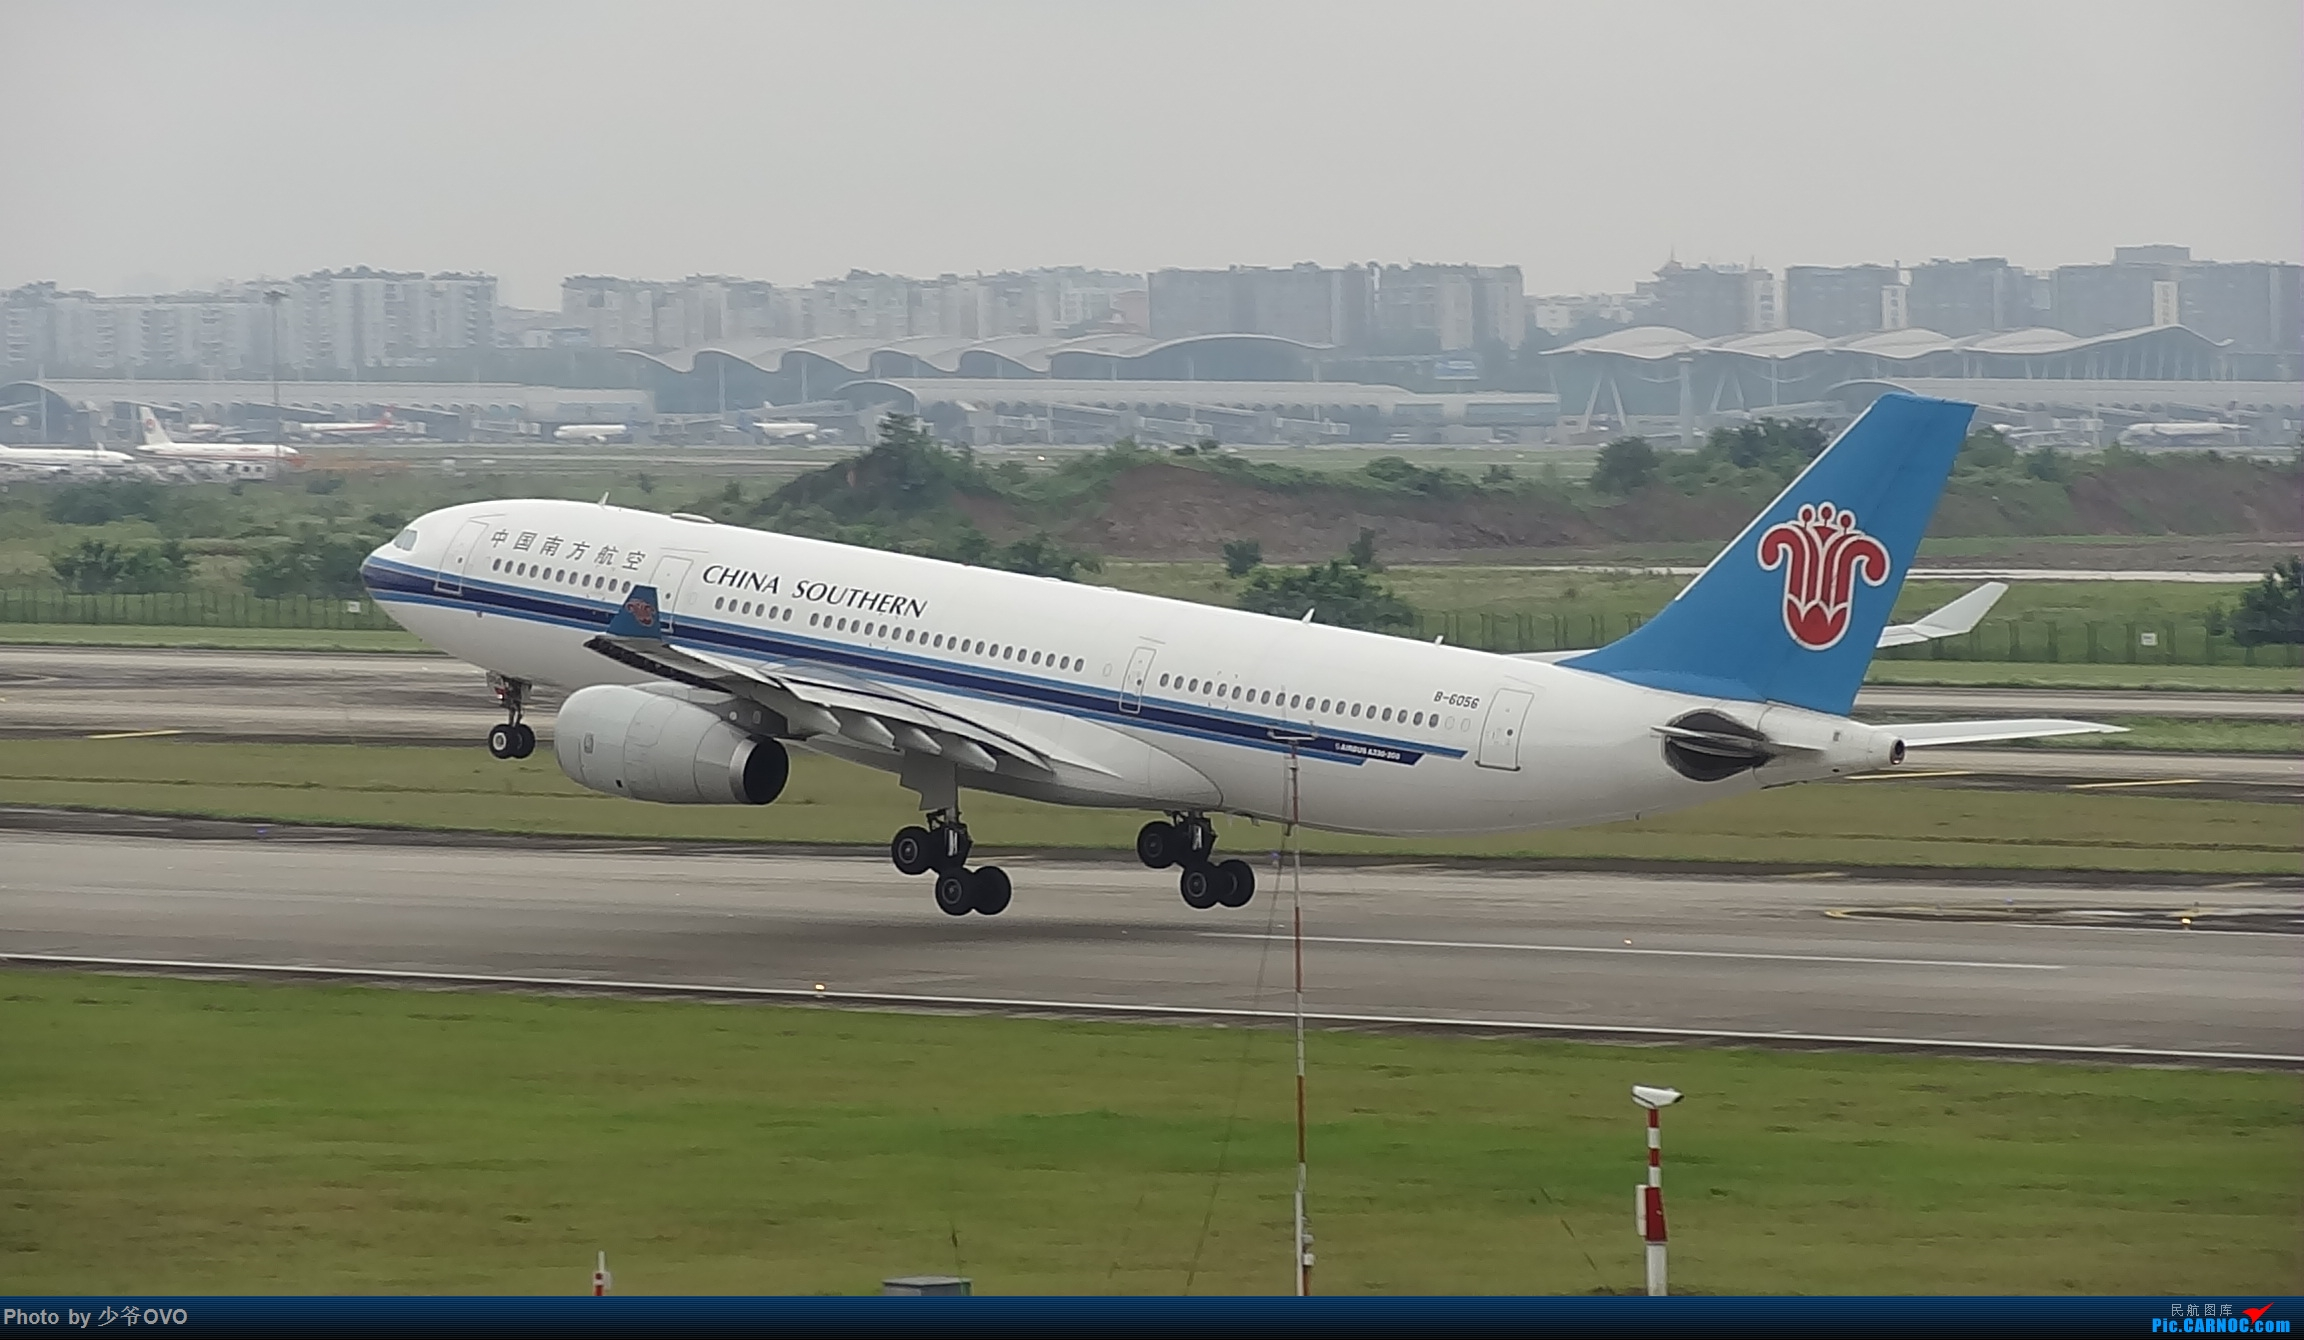 Re:[原创]CKG重庆江北机场拍机 ,中法建交50周年 AIRBUS A330-200 B-6056 中国重庆江北国际机场